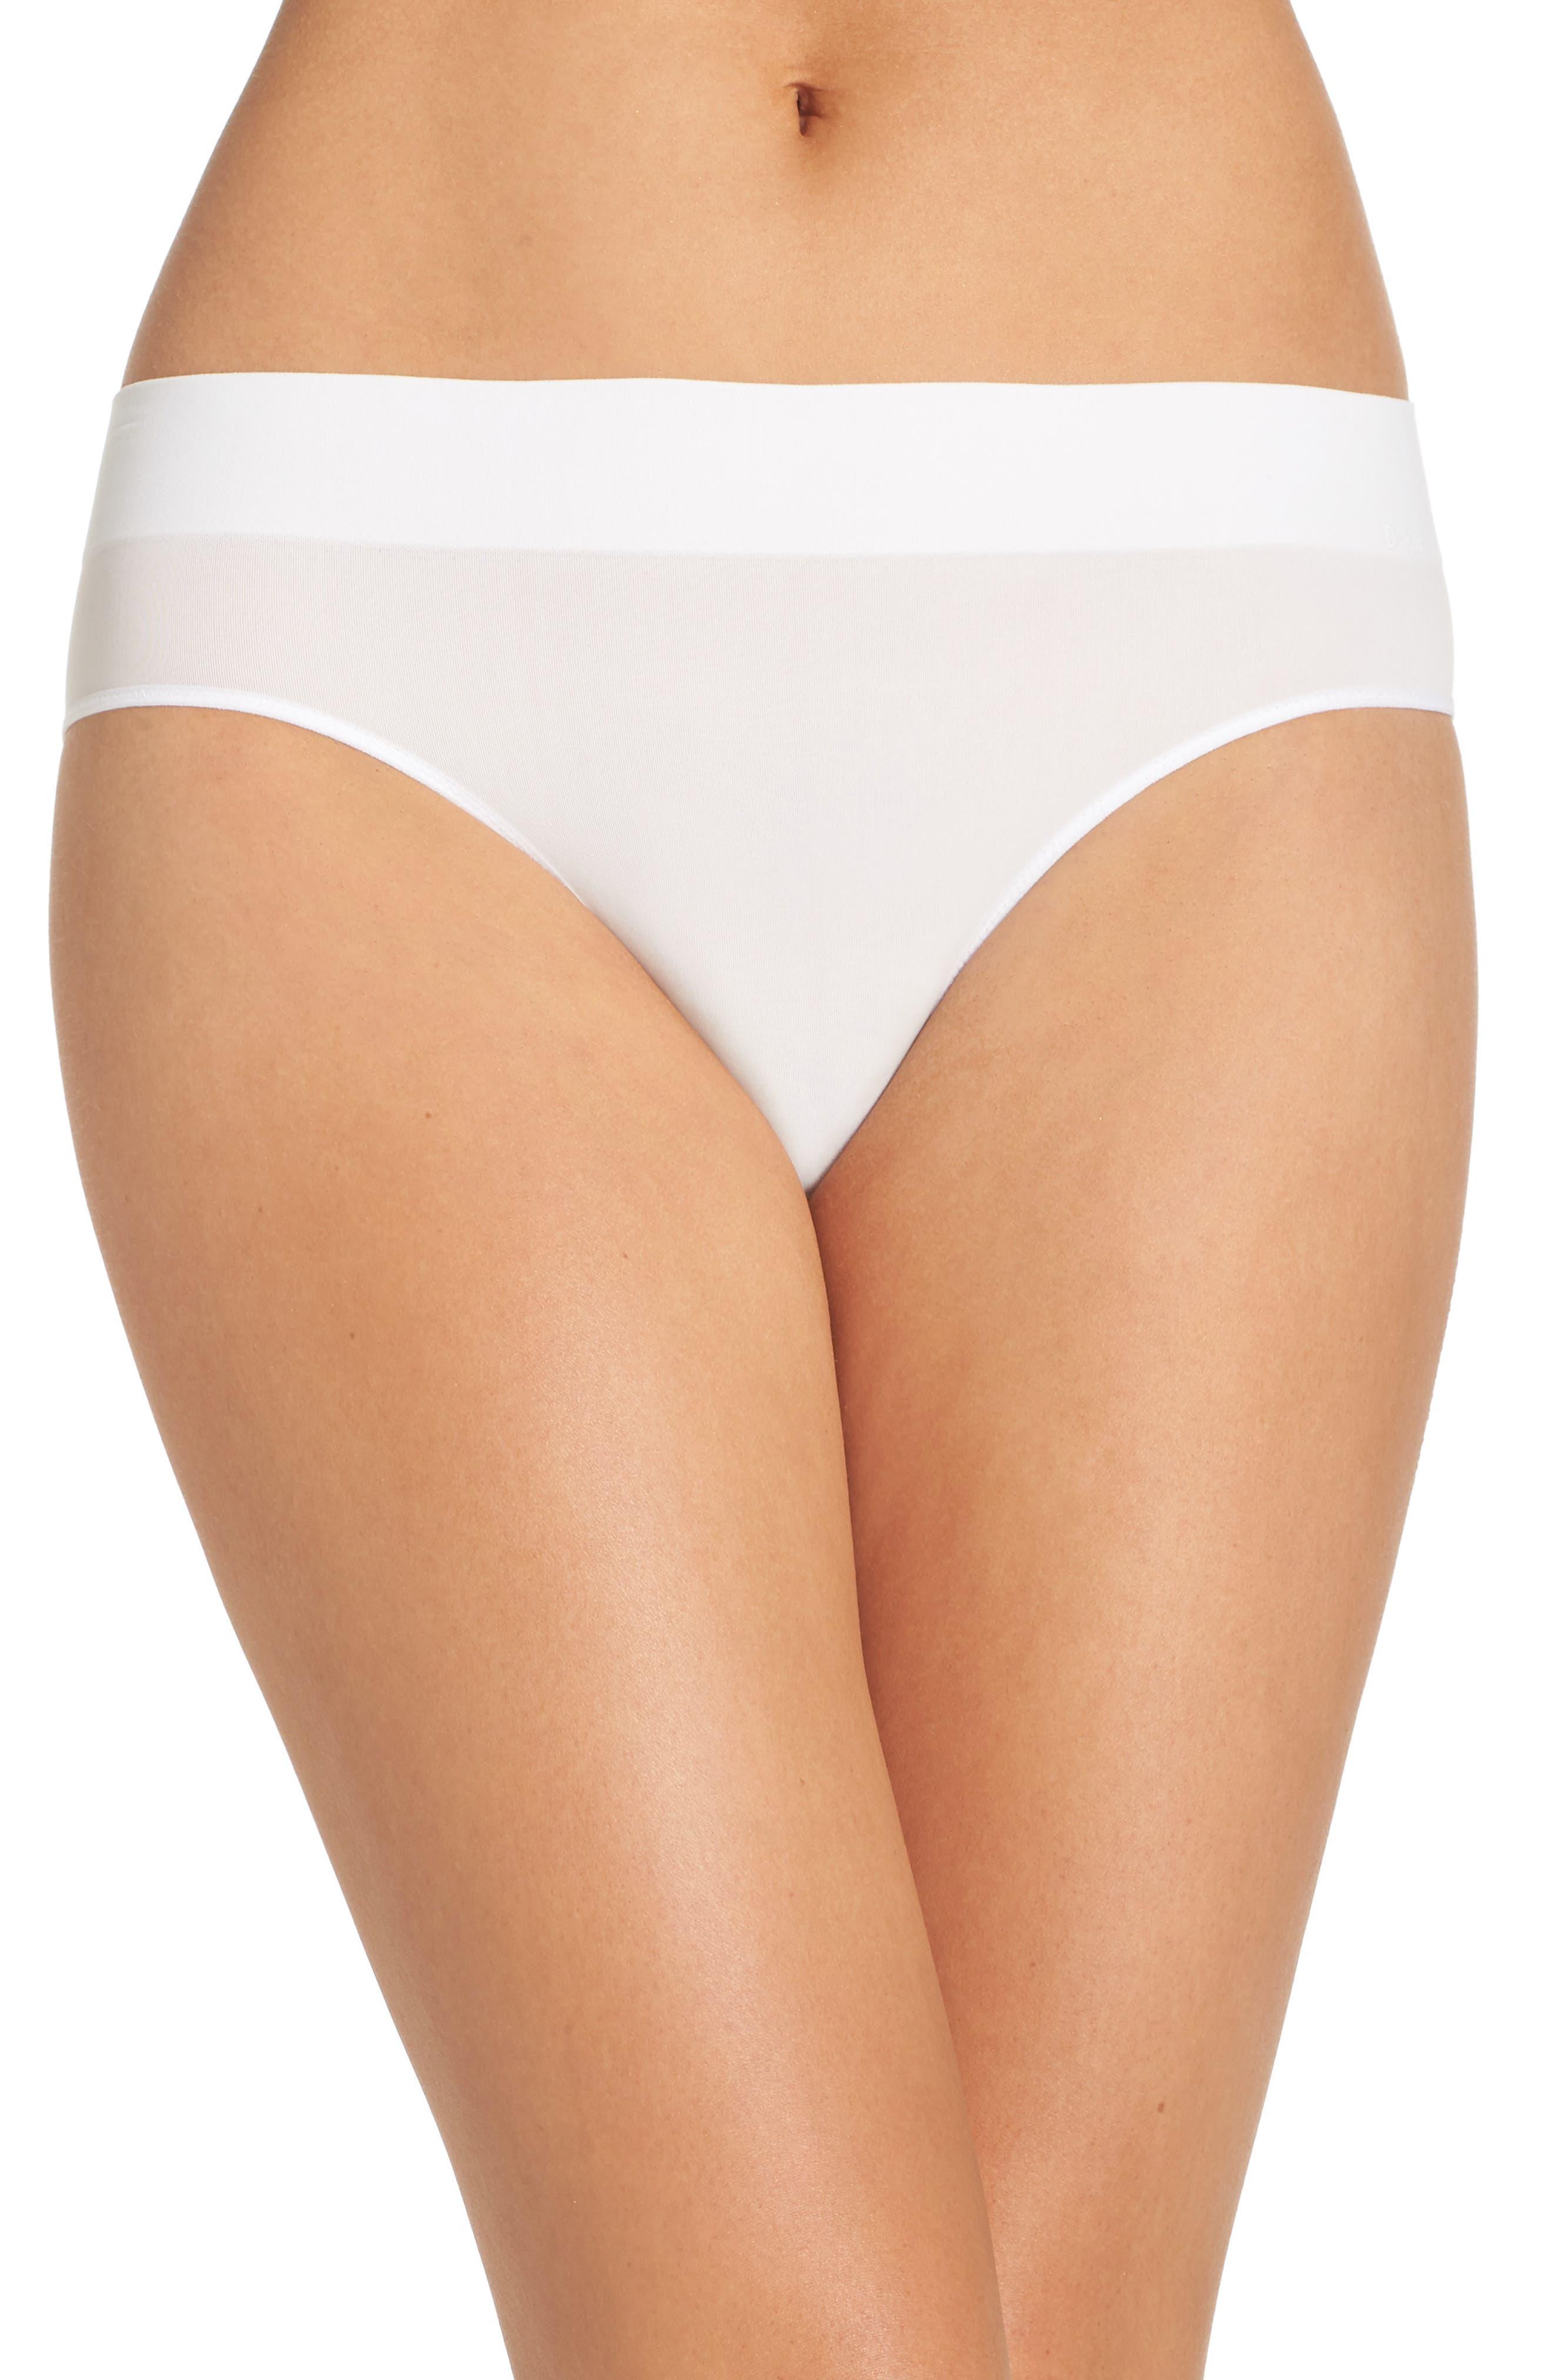 Main Image - DKNY LiteWear Seamless Bikini (3 for $33)